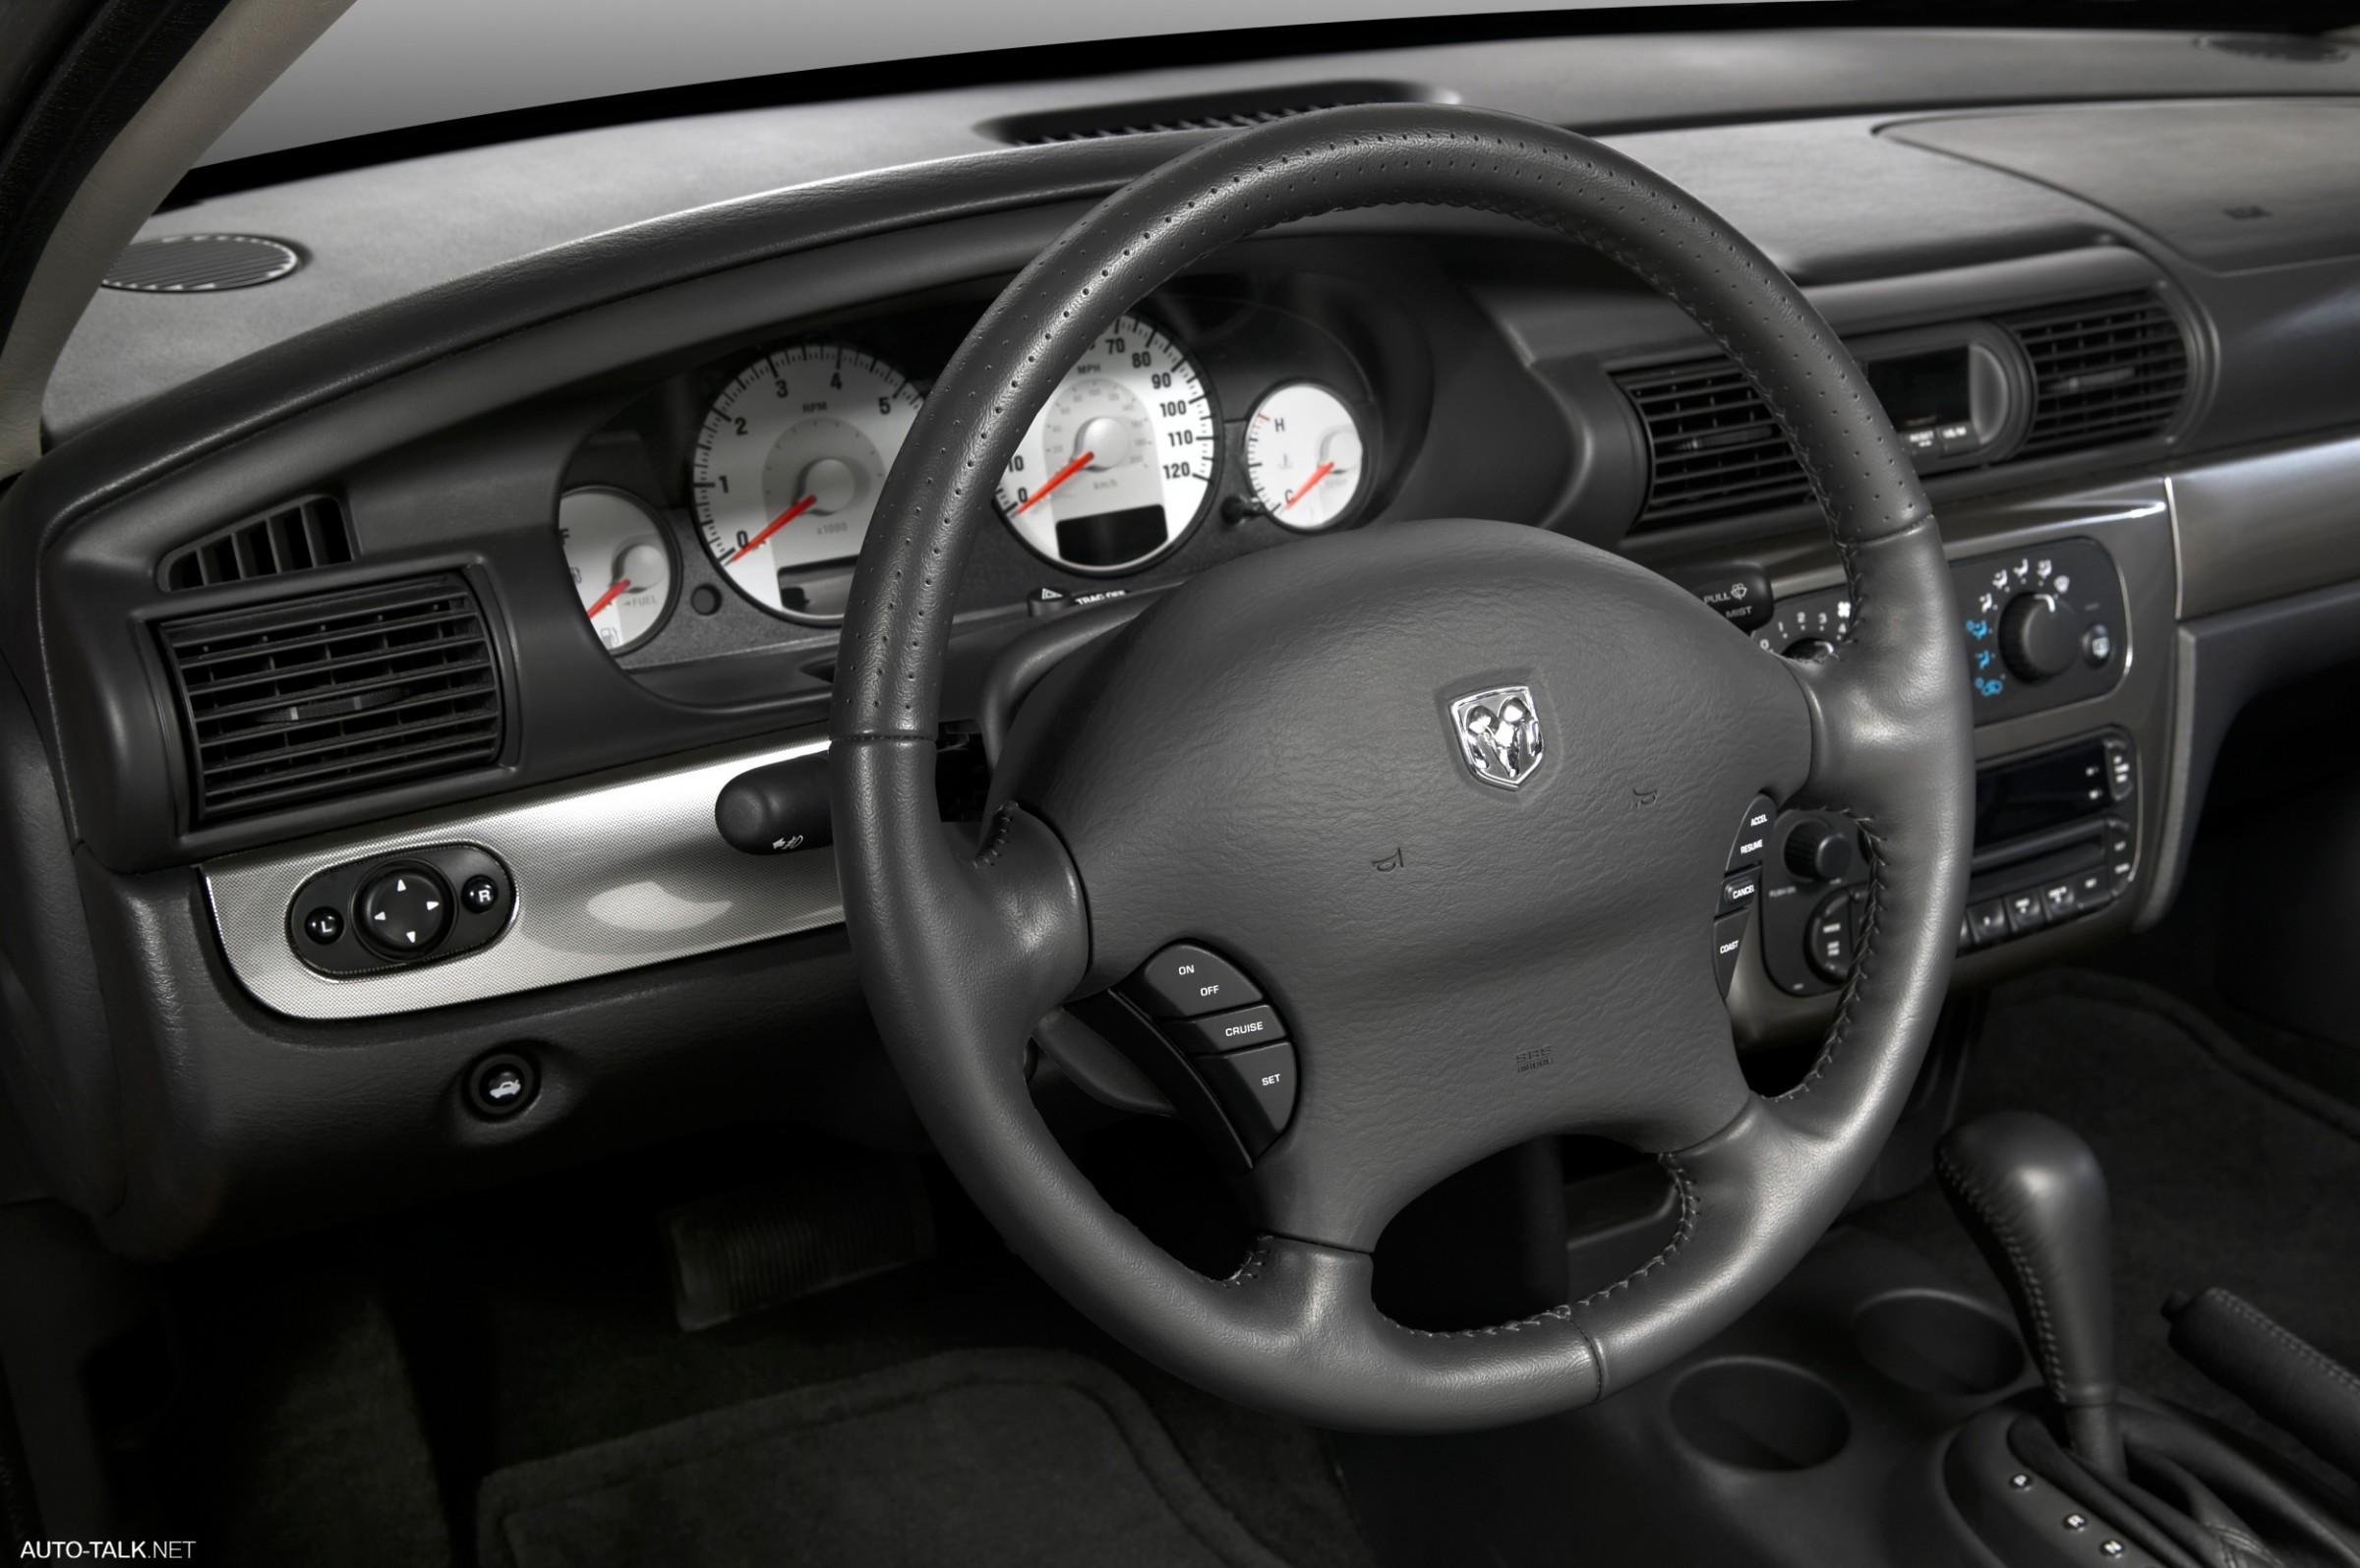 Dodge Stratus I - описание модели